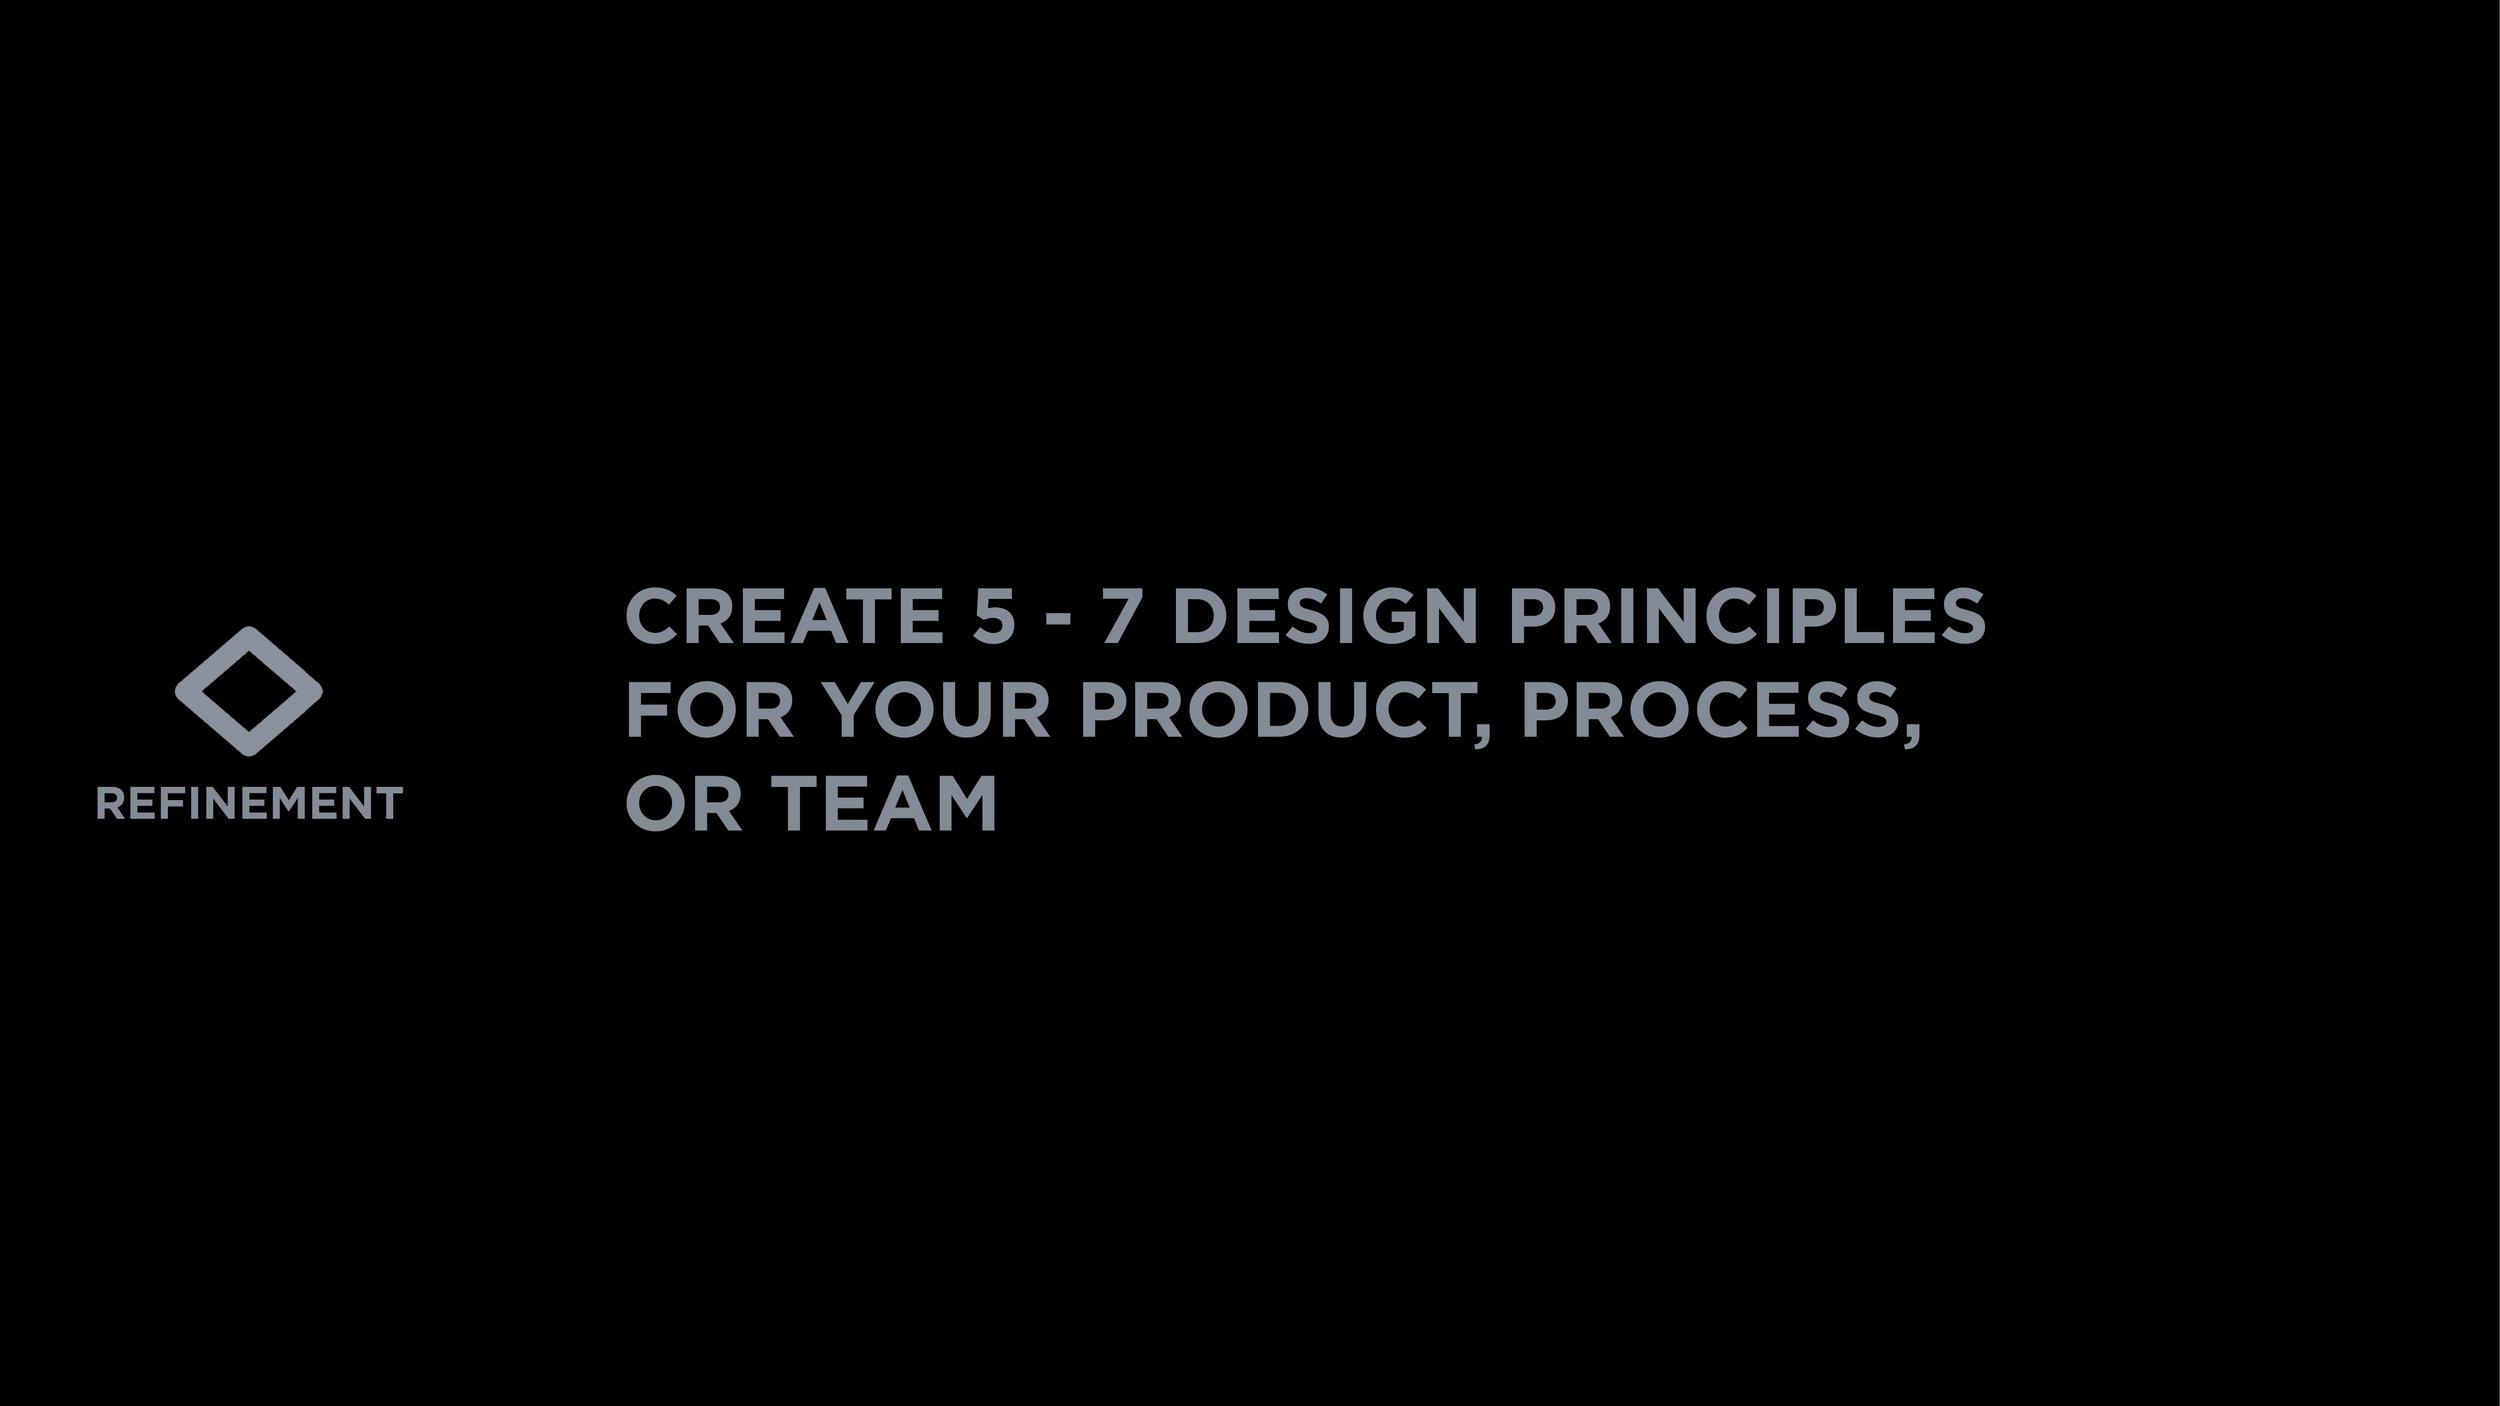 IDEO_CultureSummit_JL_v2-28.jpg